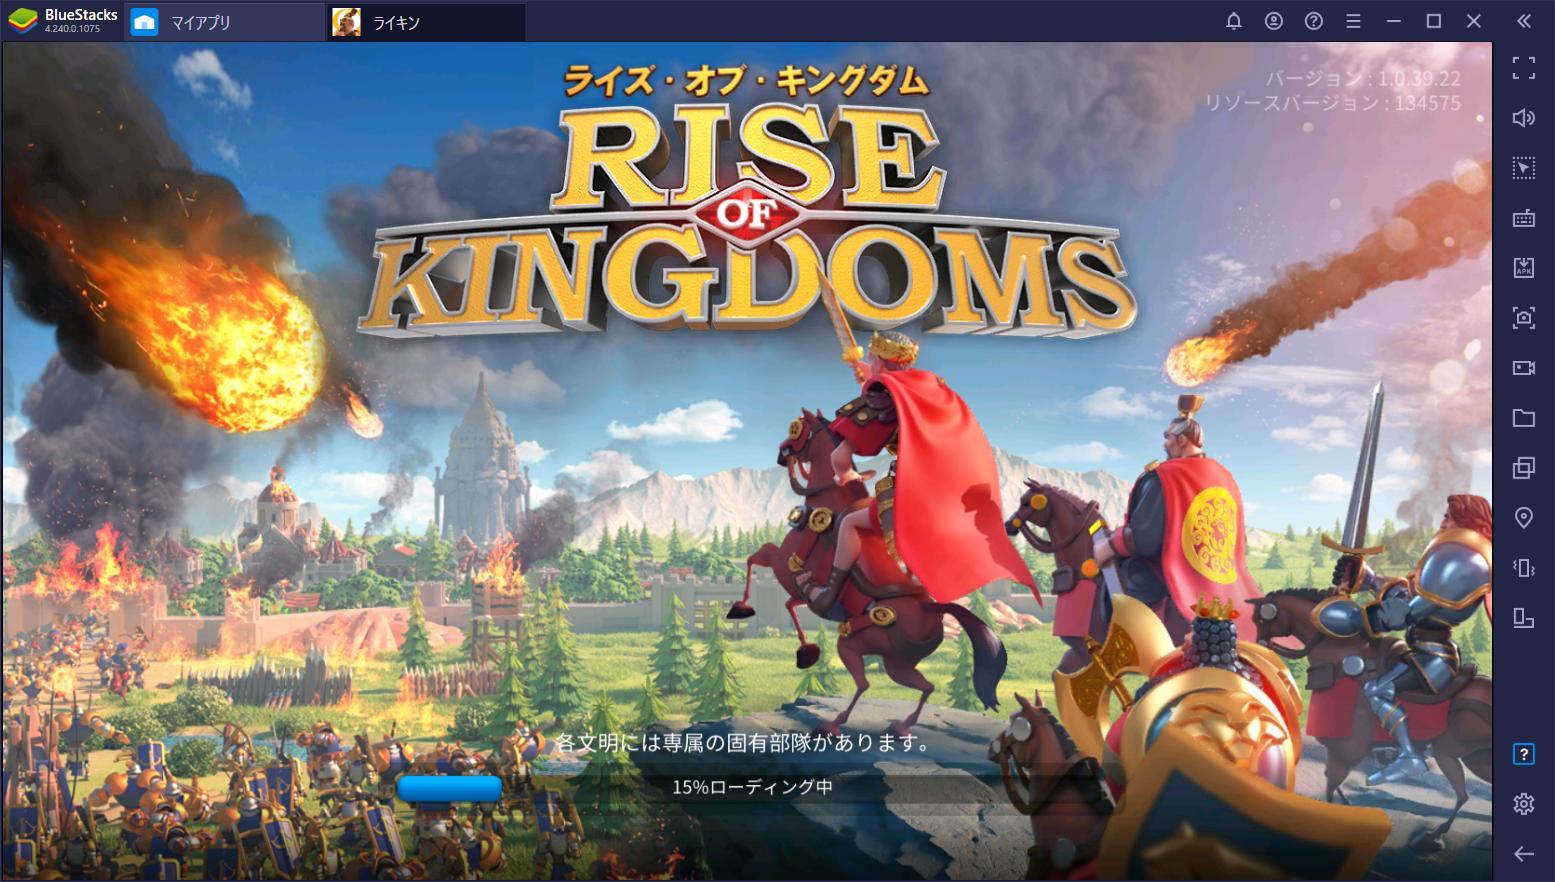 BlueStacks:『Rise of Kingdoms ―万国覚醒―』の基本的な遊び方と攻略ポイント